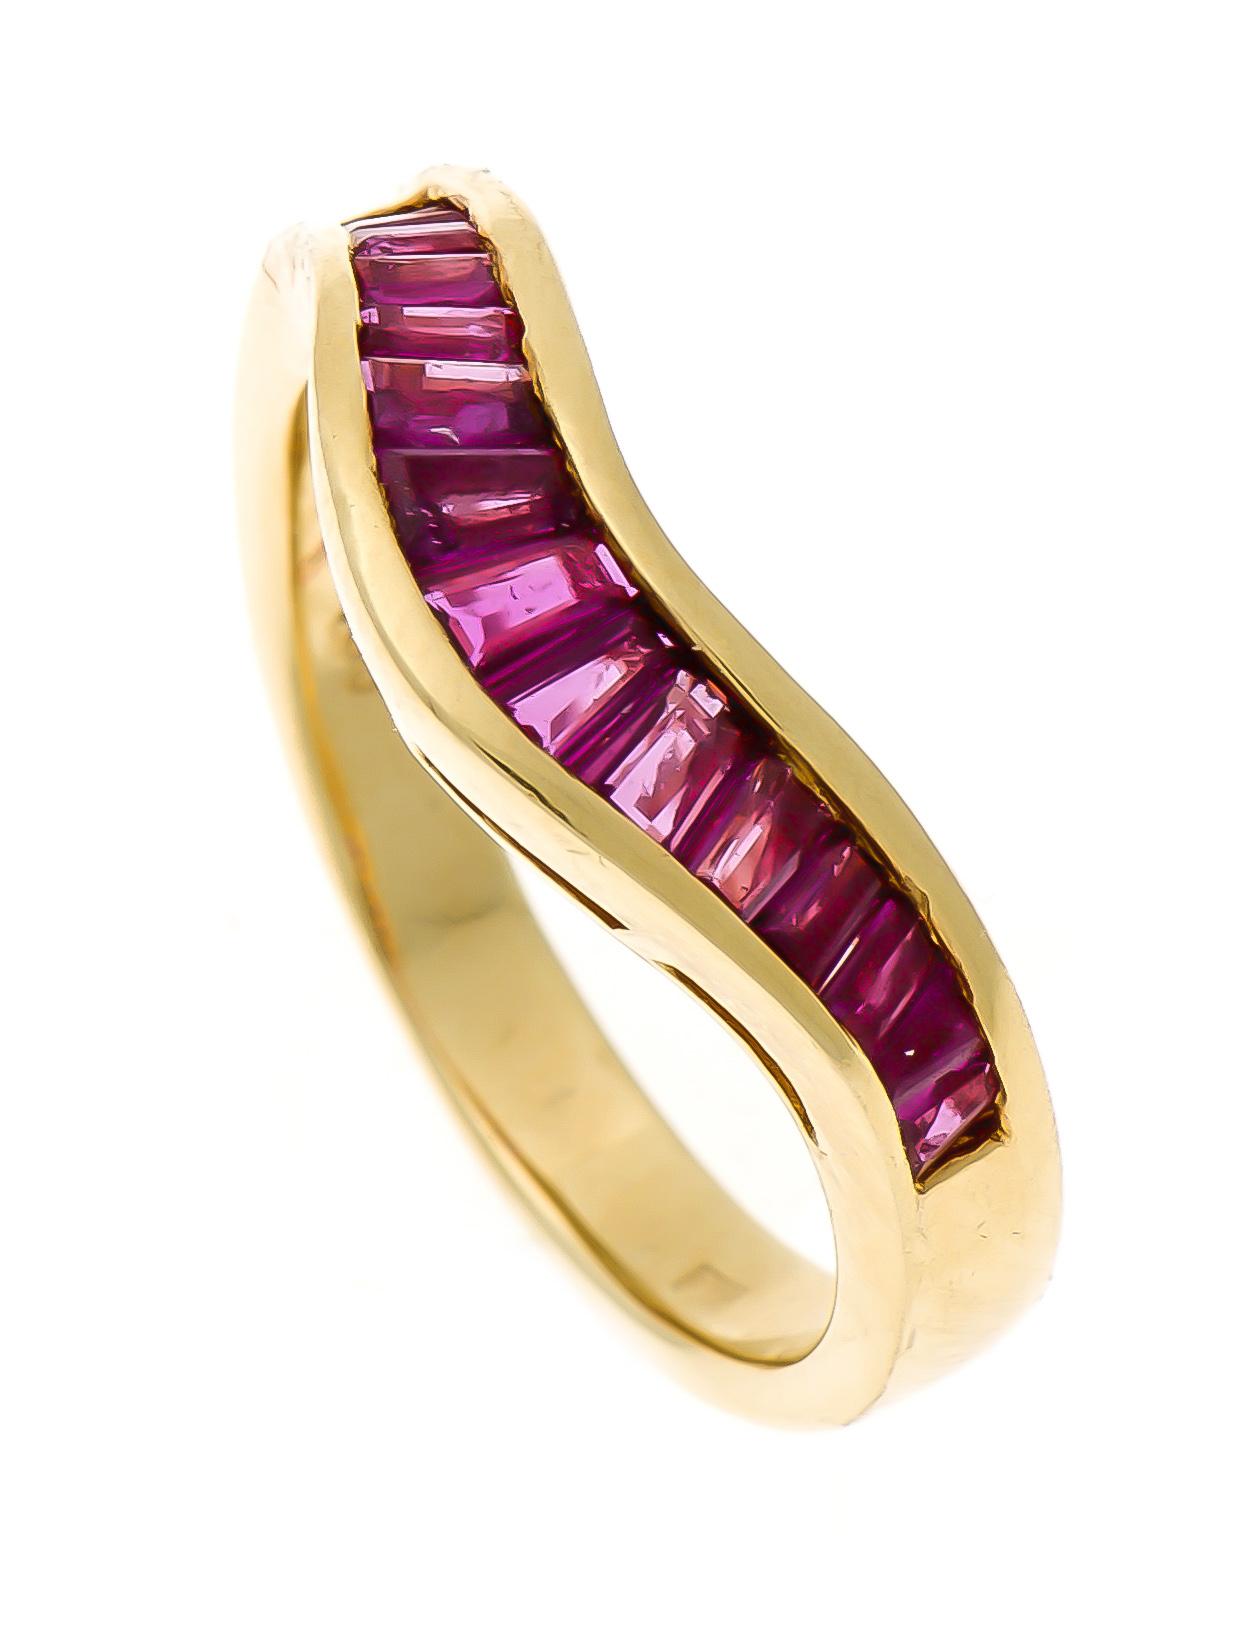 Rubin-Ring GG 750/000 mit feinen fac